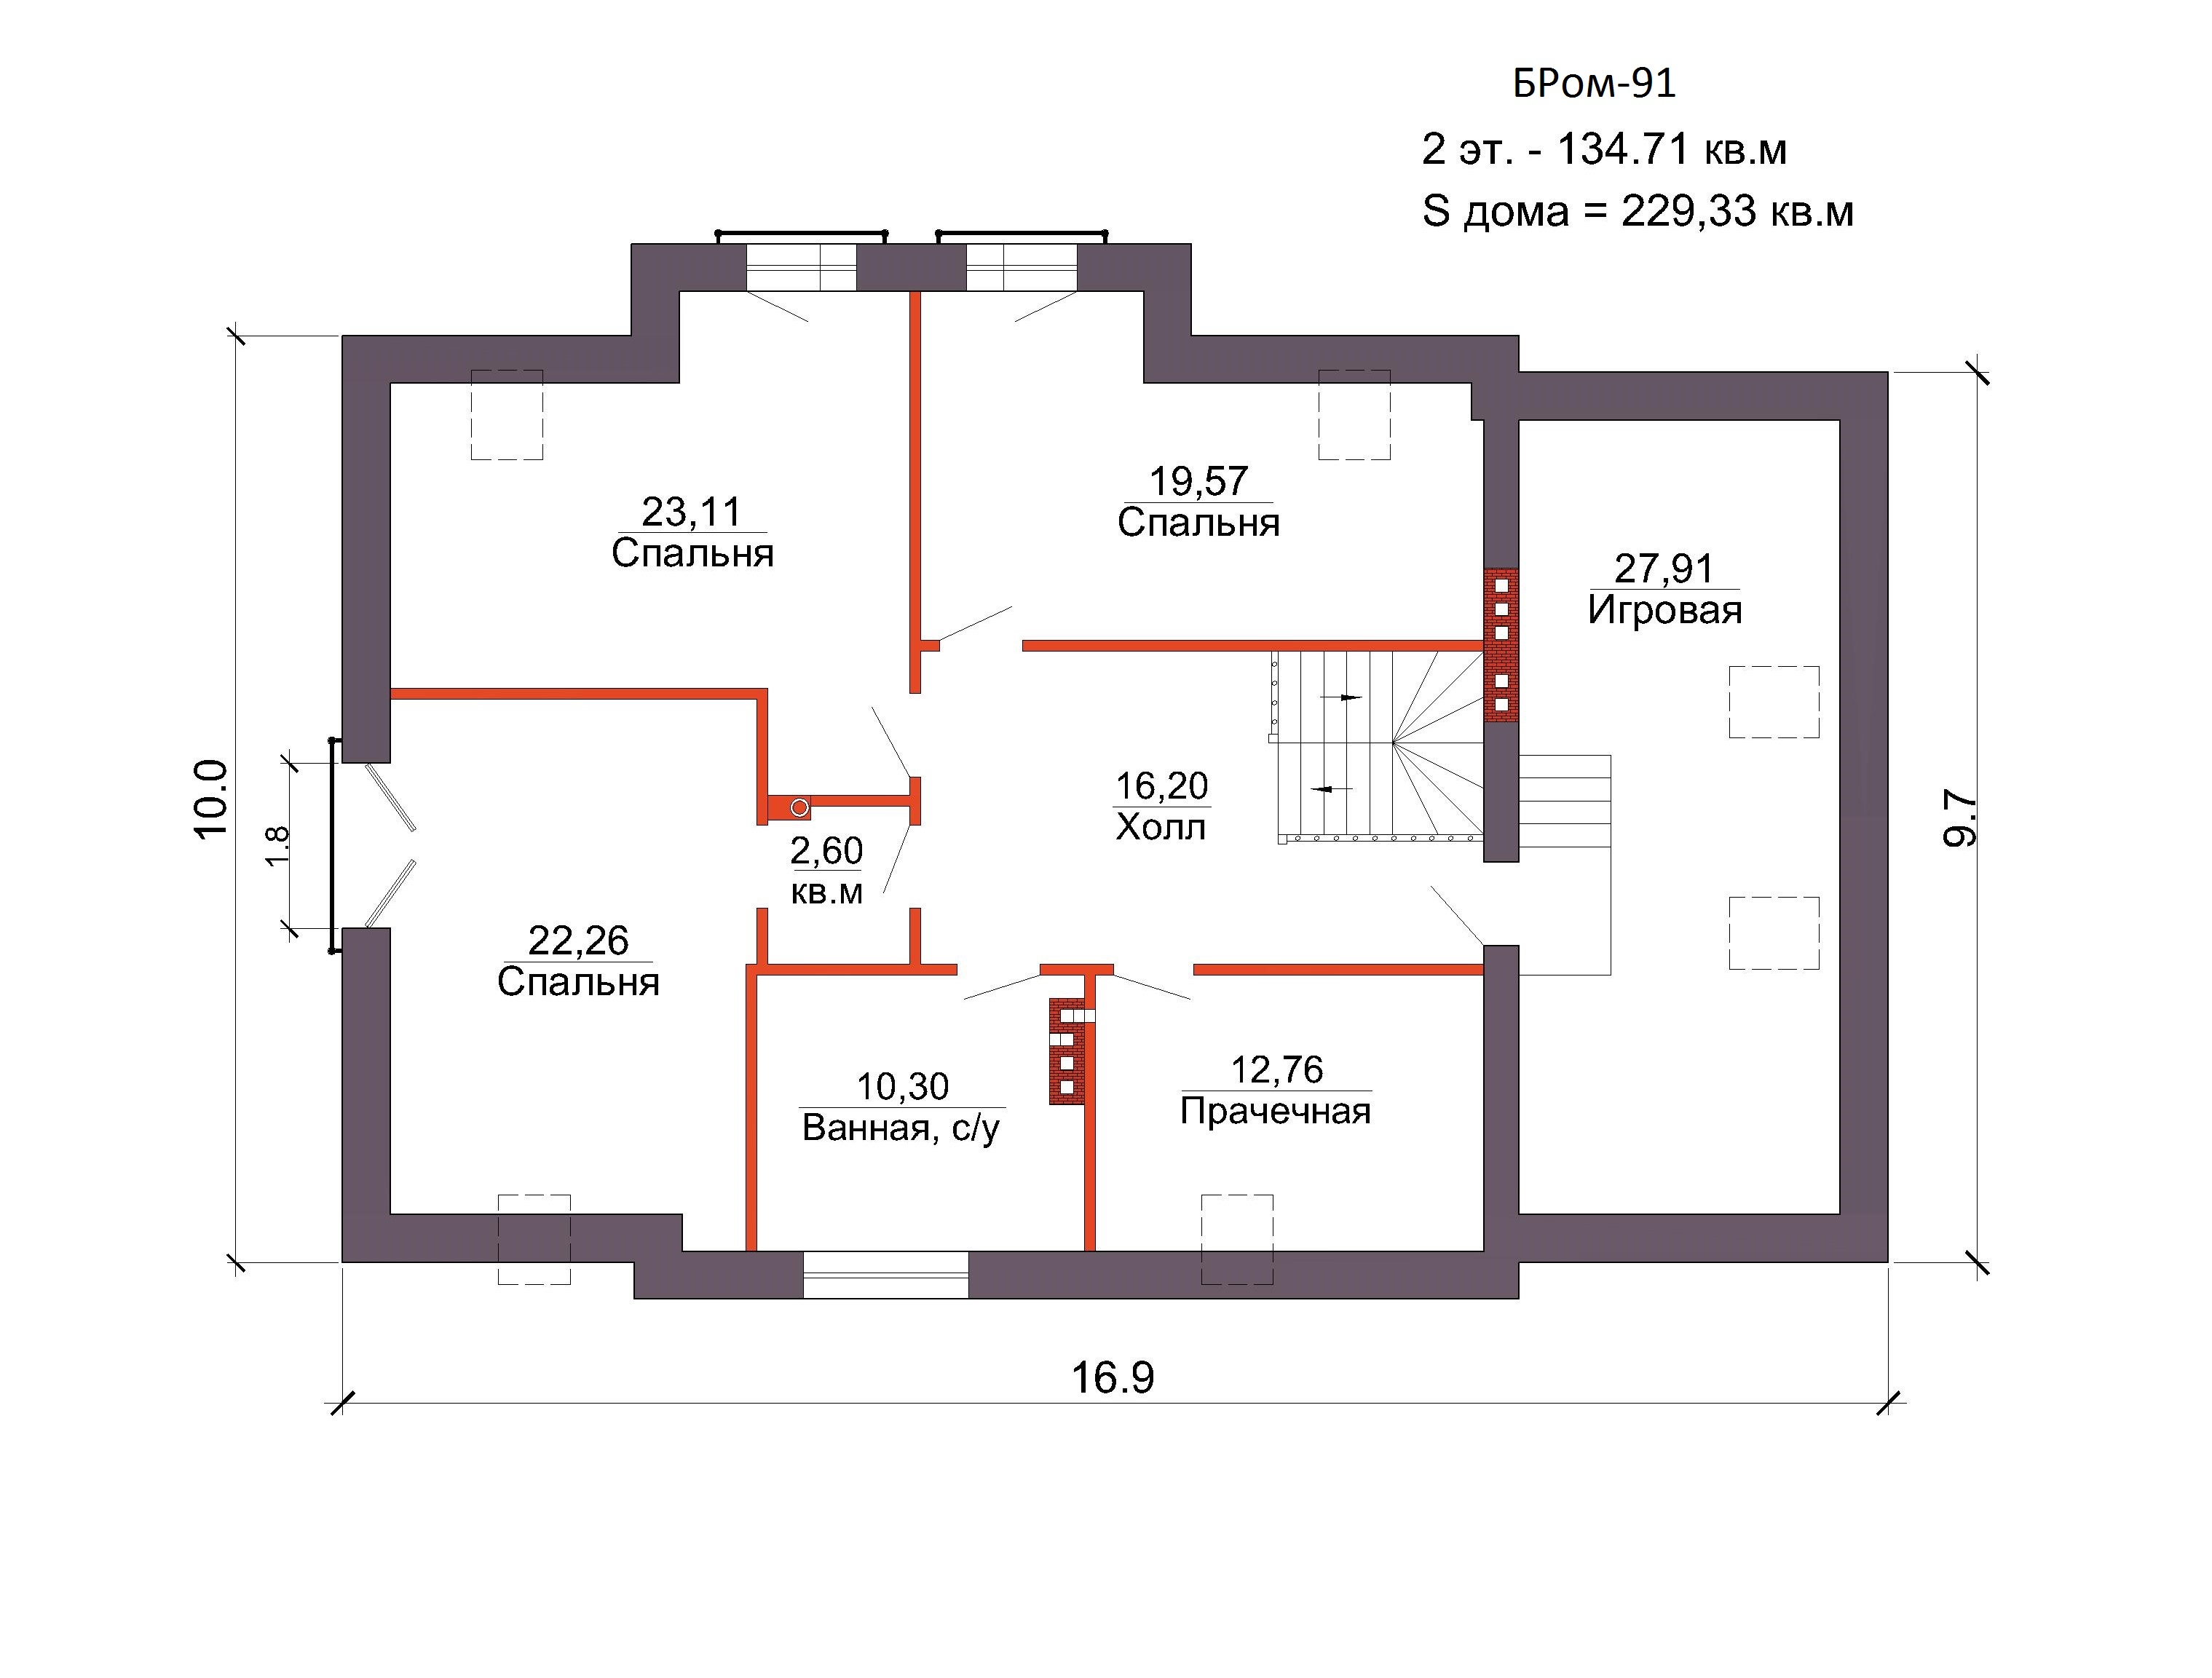 Проект коттеджа 229 кв. м / Артикул бром-91 план